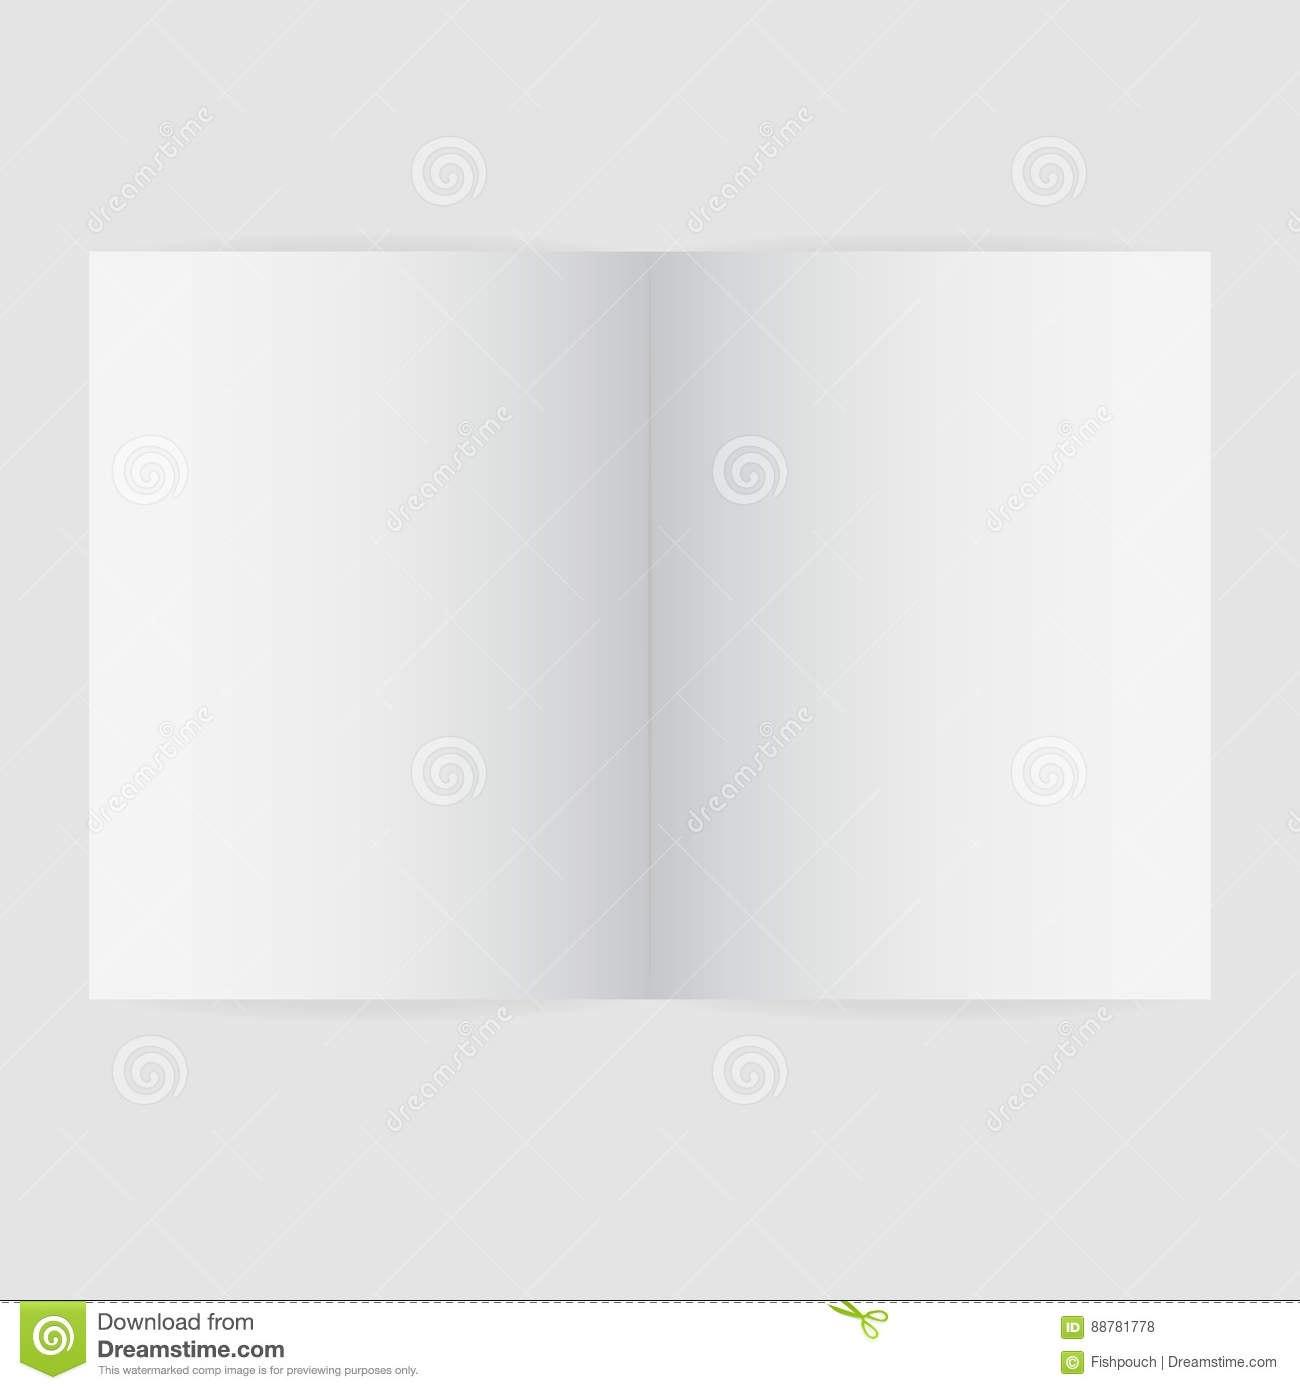 Blank Magazine Spread Template Vector Illustration Illustration For Blank Magazine Spread Template